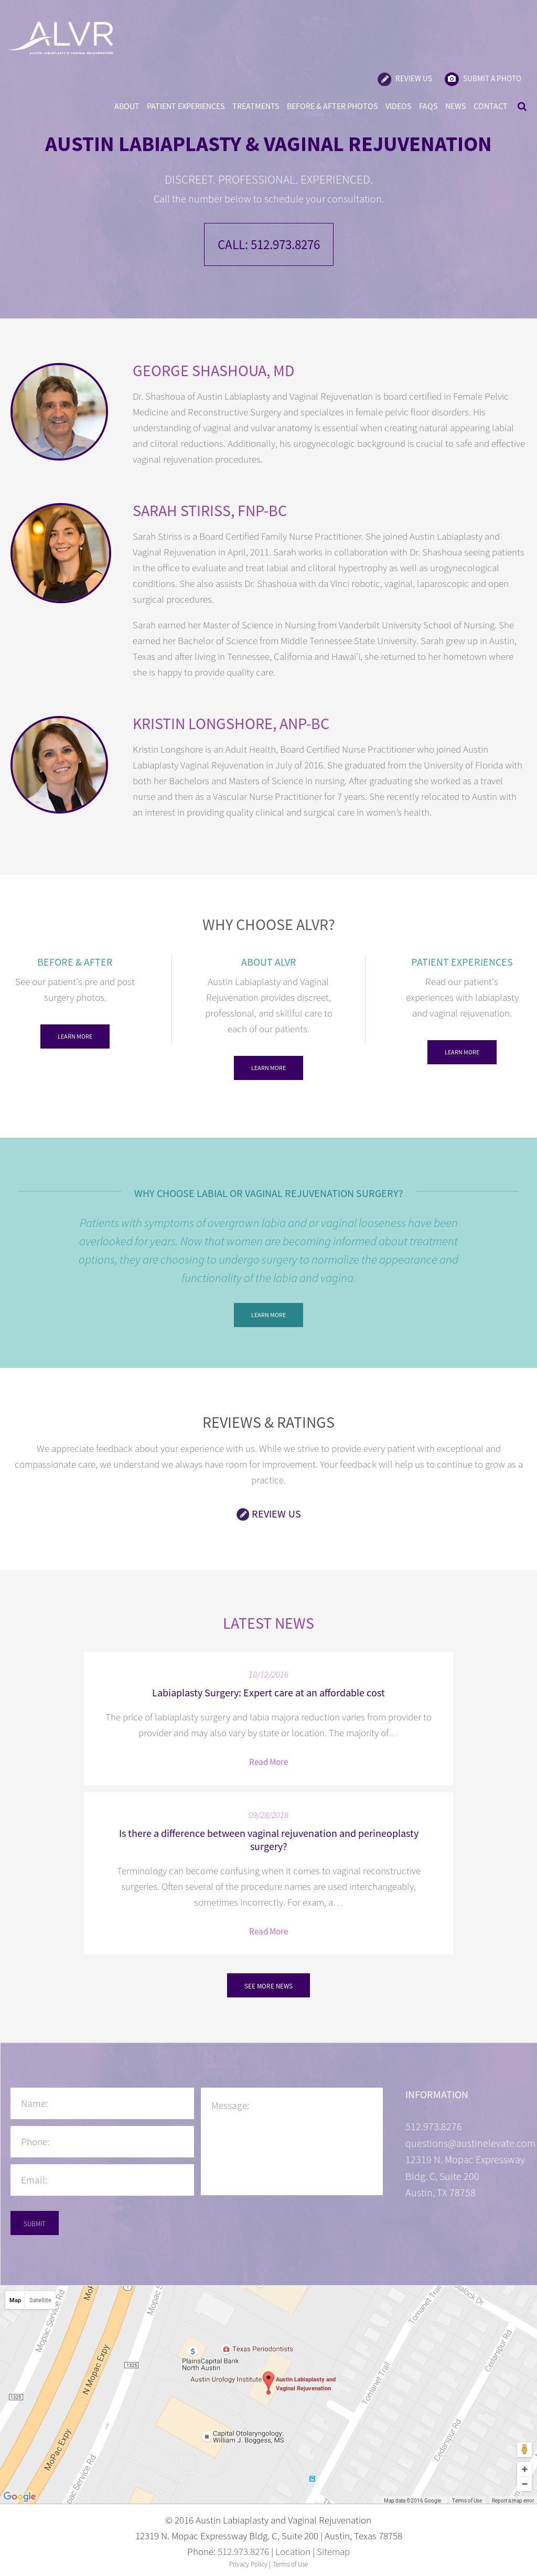 Austin Labiaplasty And Vaginal Rejuvenation Competitors, Revenue and